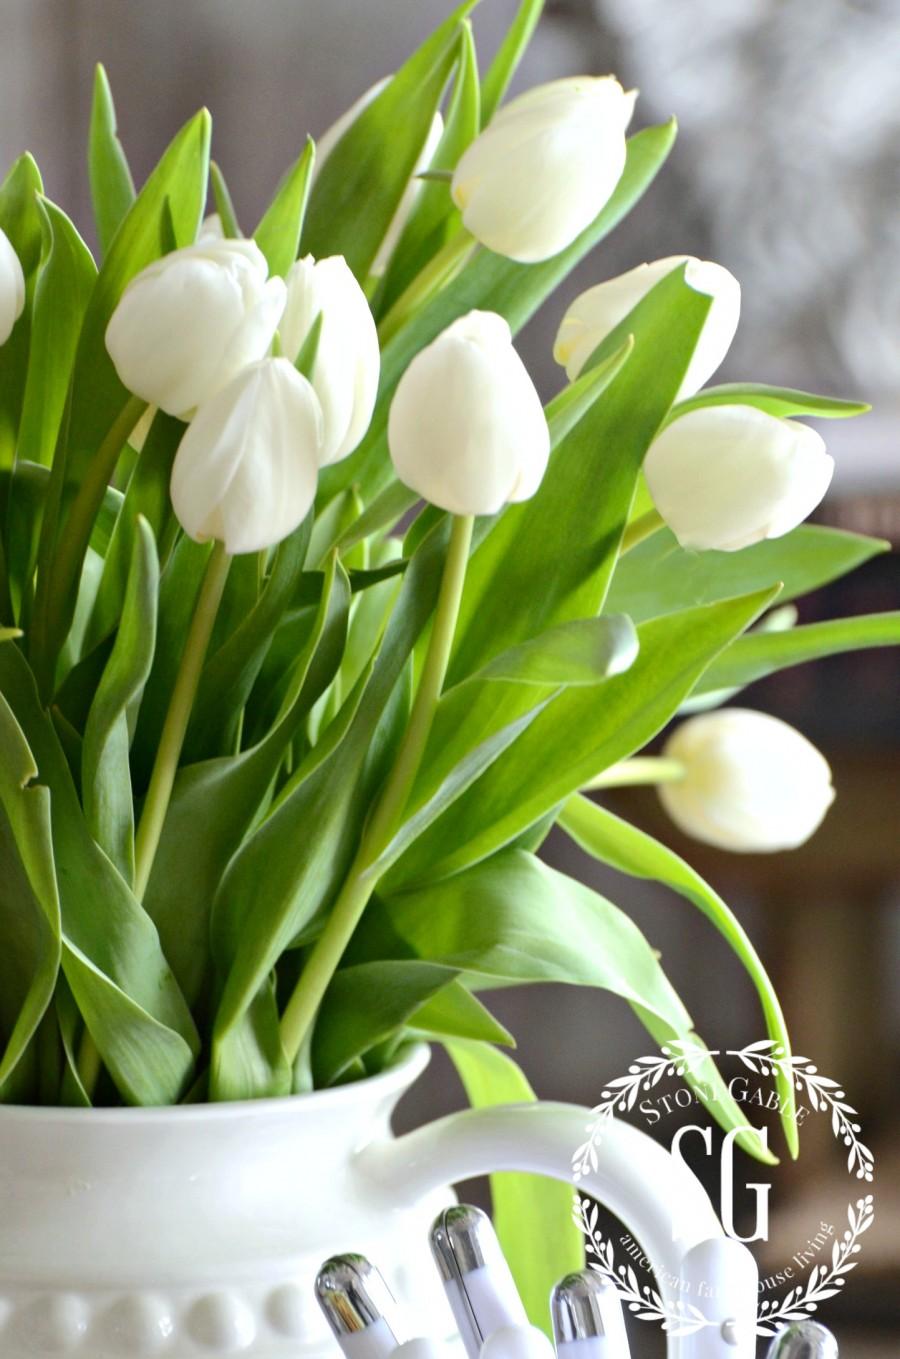 SPRING KITCHEN TABLE VIGNETTE-white tulips in an ironstone pitcher-stonegableblog.com